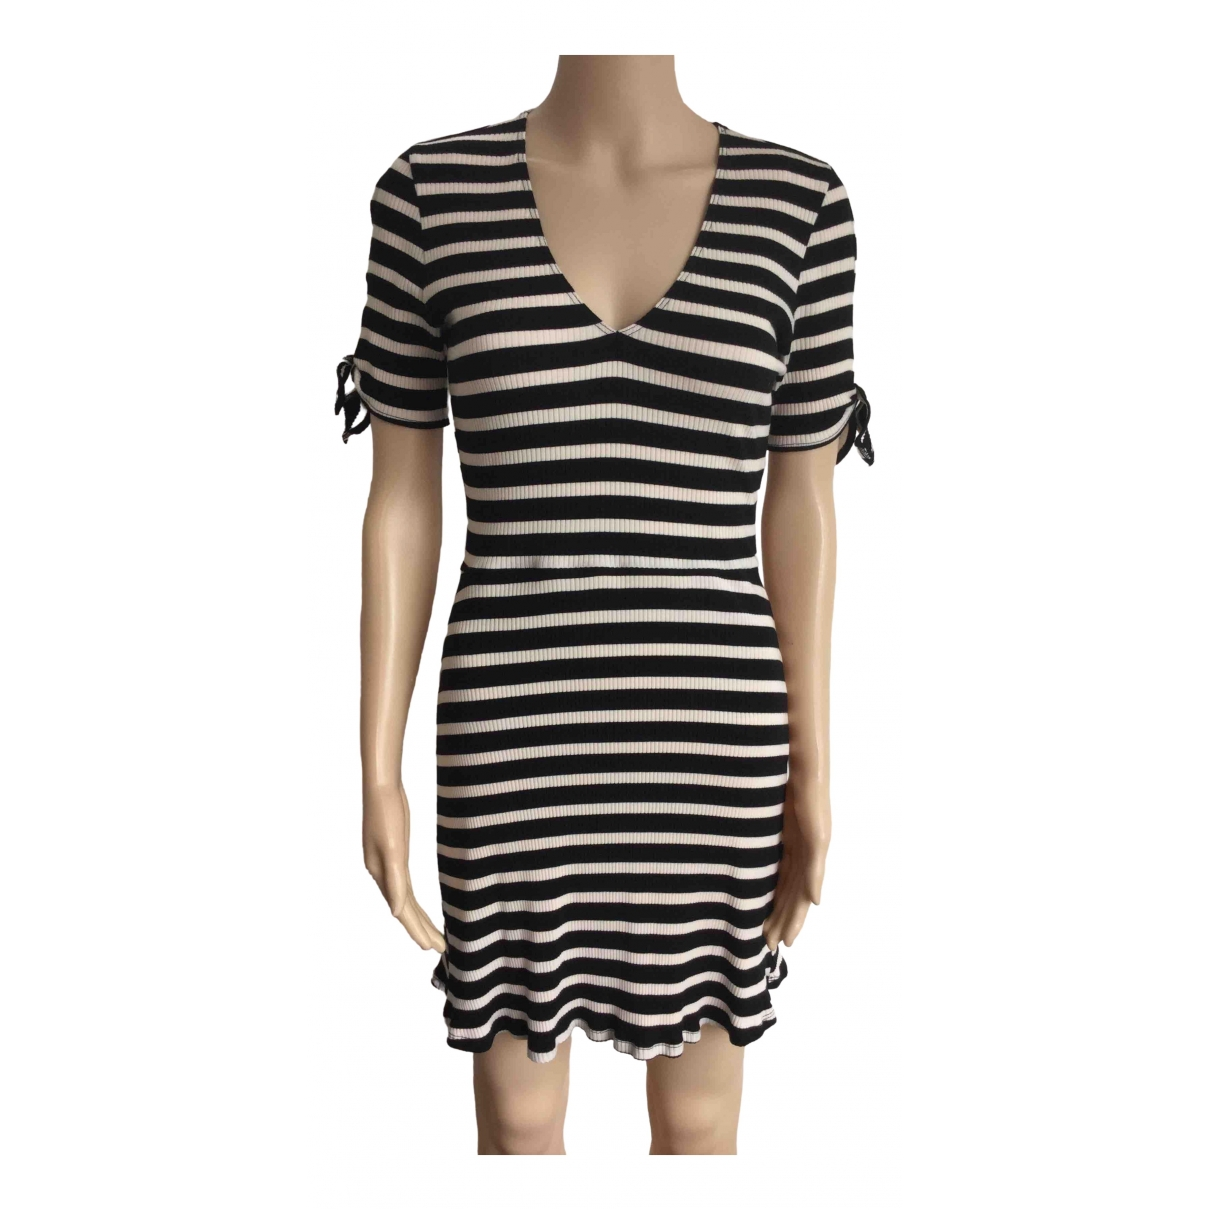 Reformation \N Black dress for Women L International